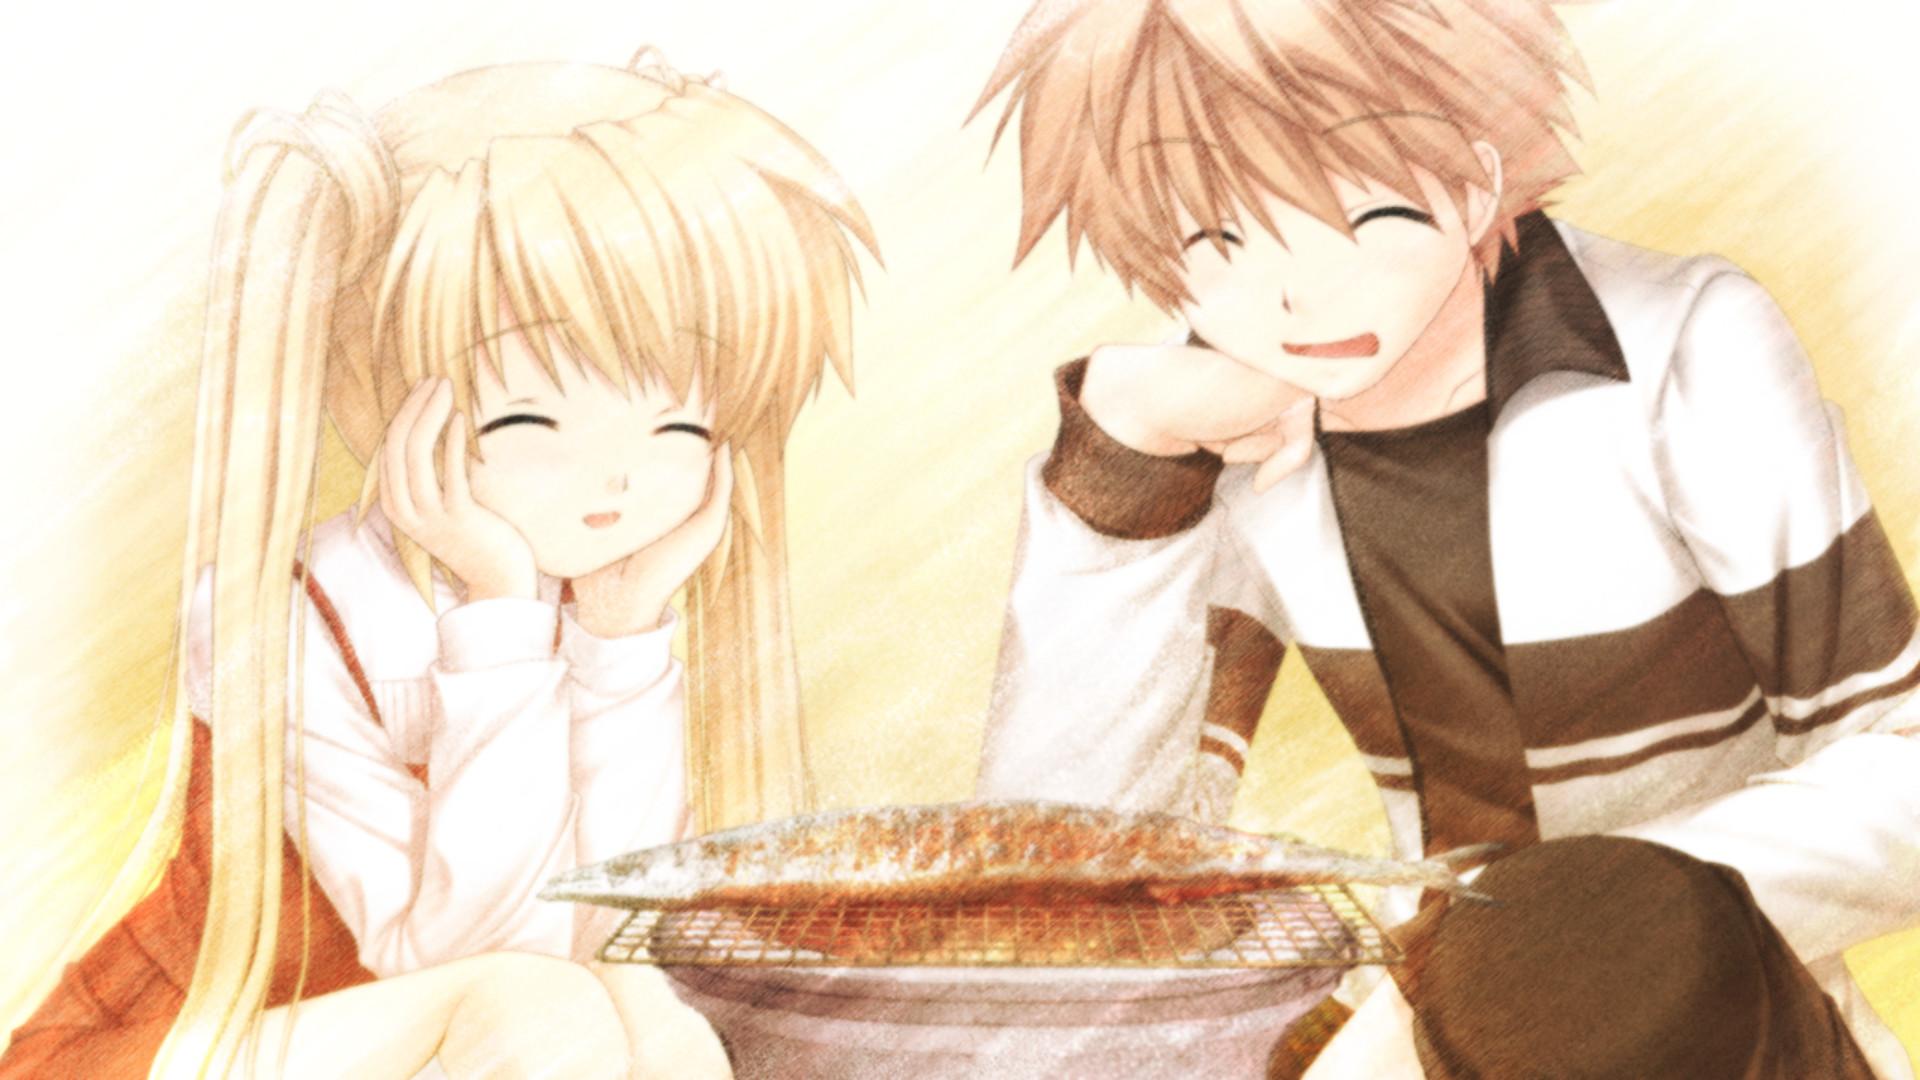 Res: 1920x1080, Heartwarming, sad anime images Rewrite - Shizuru and Saury ;( HD wallpaper  and background photos